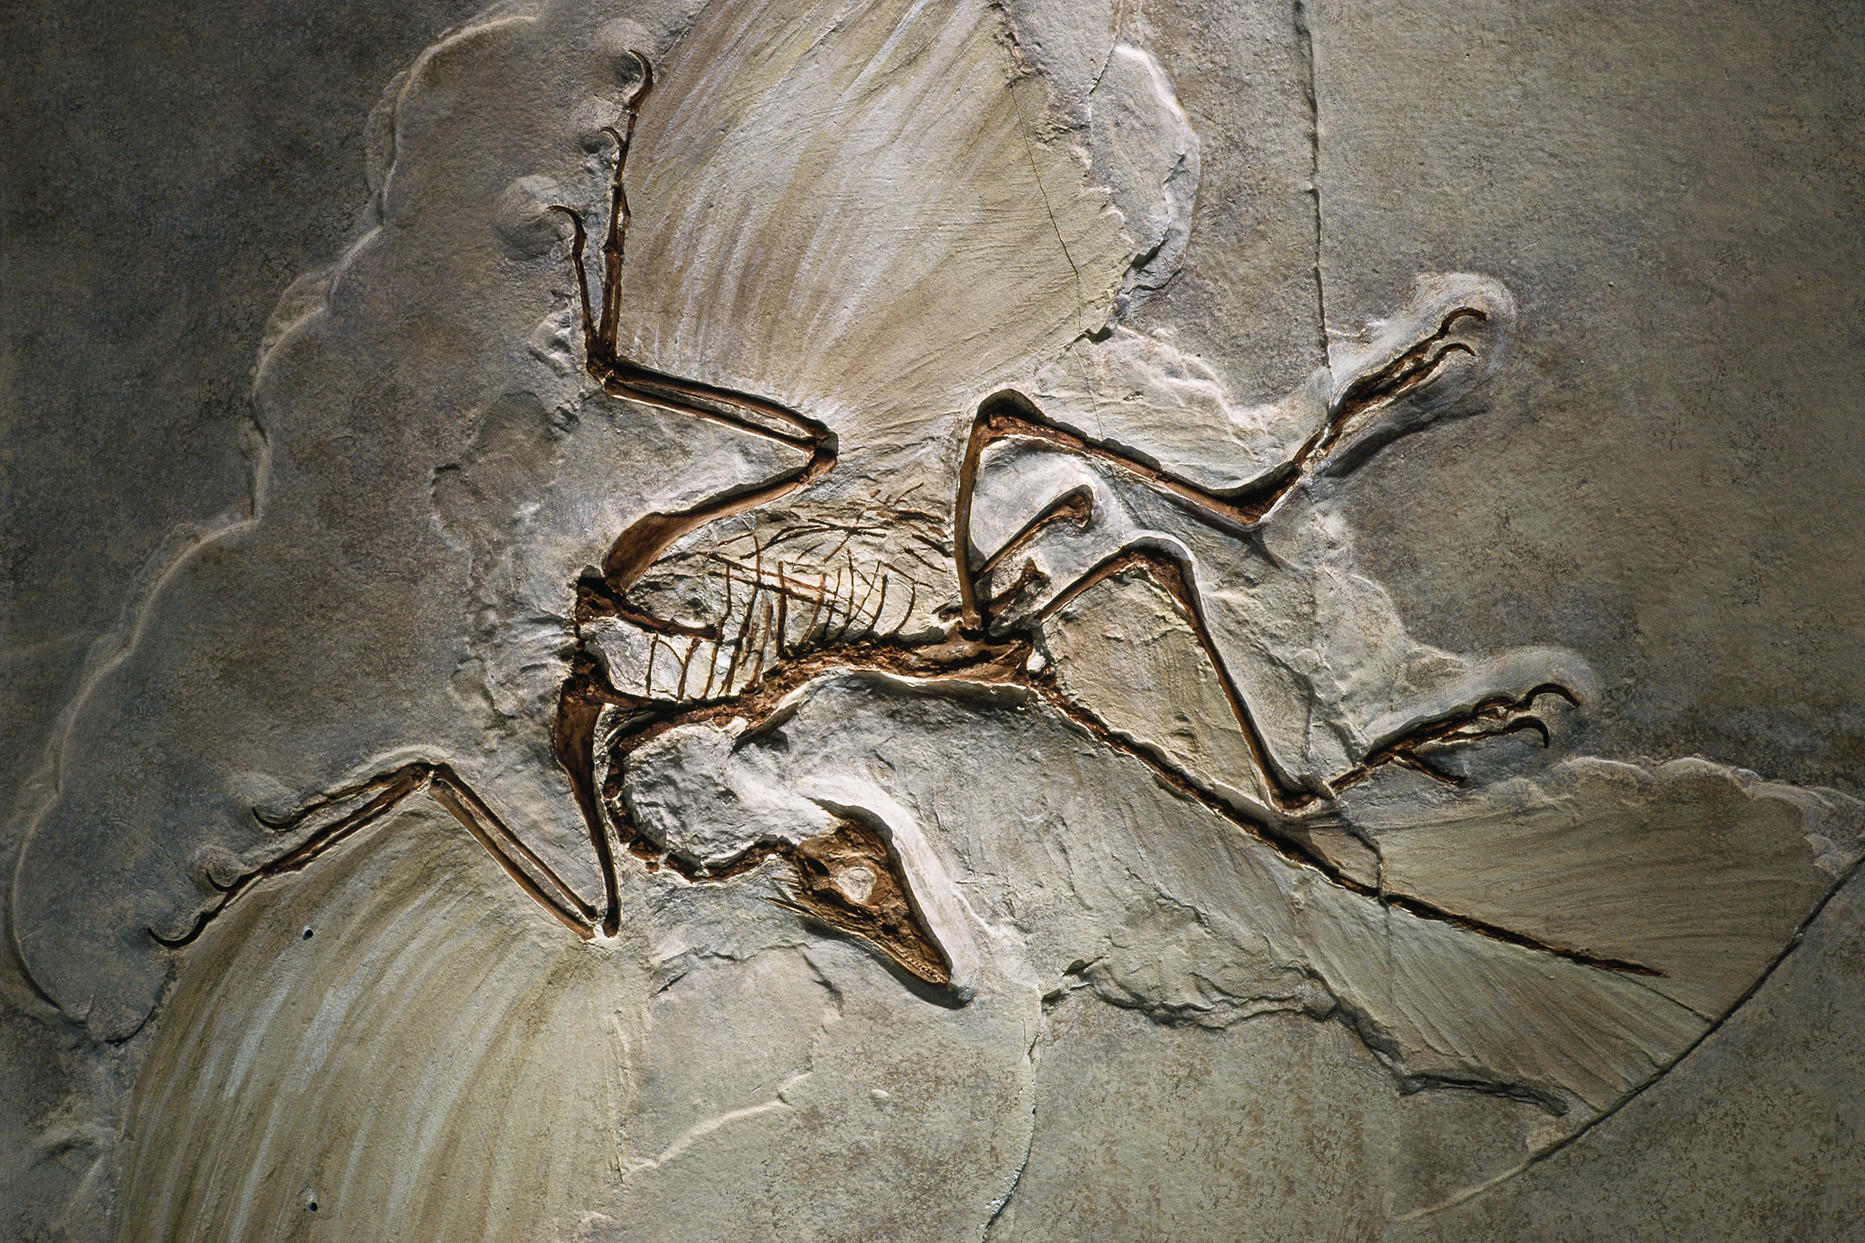 Archaeopteryx_fossil.jpg